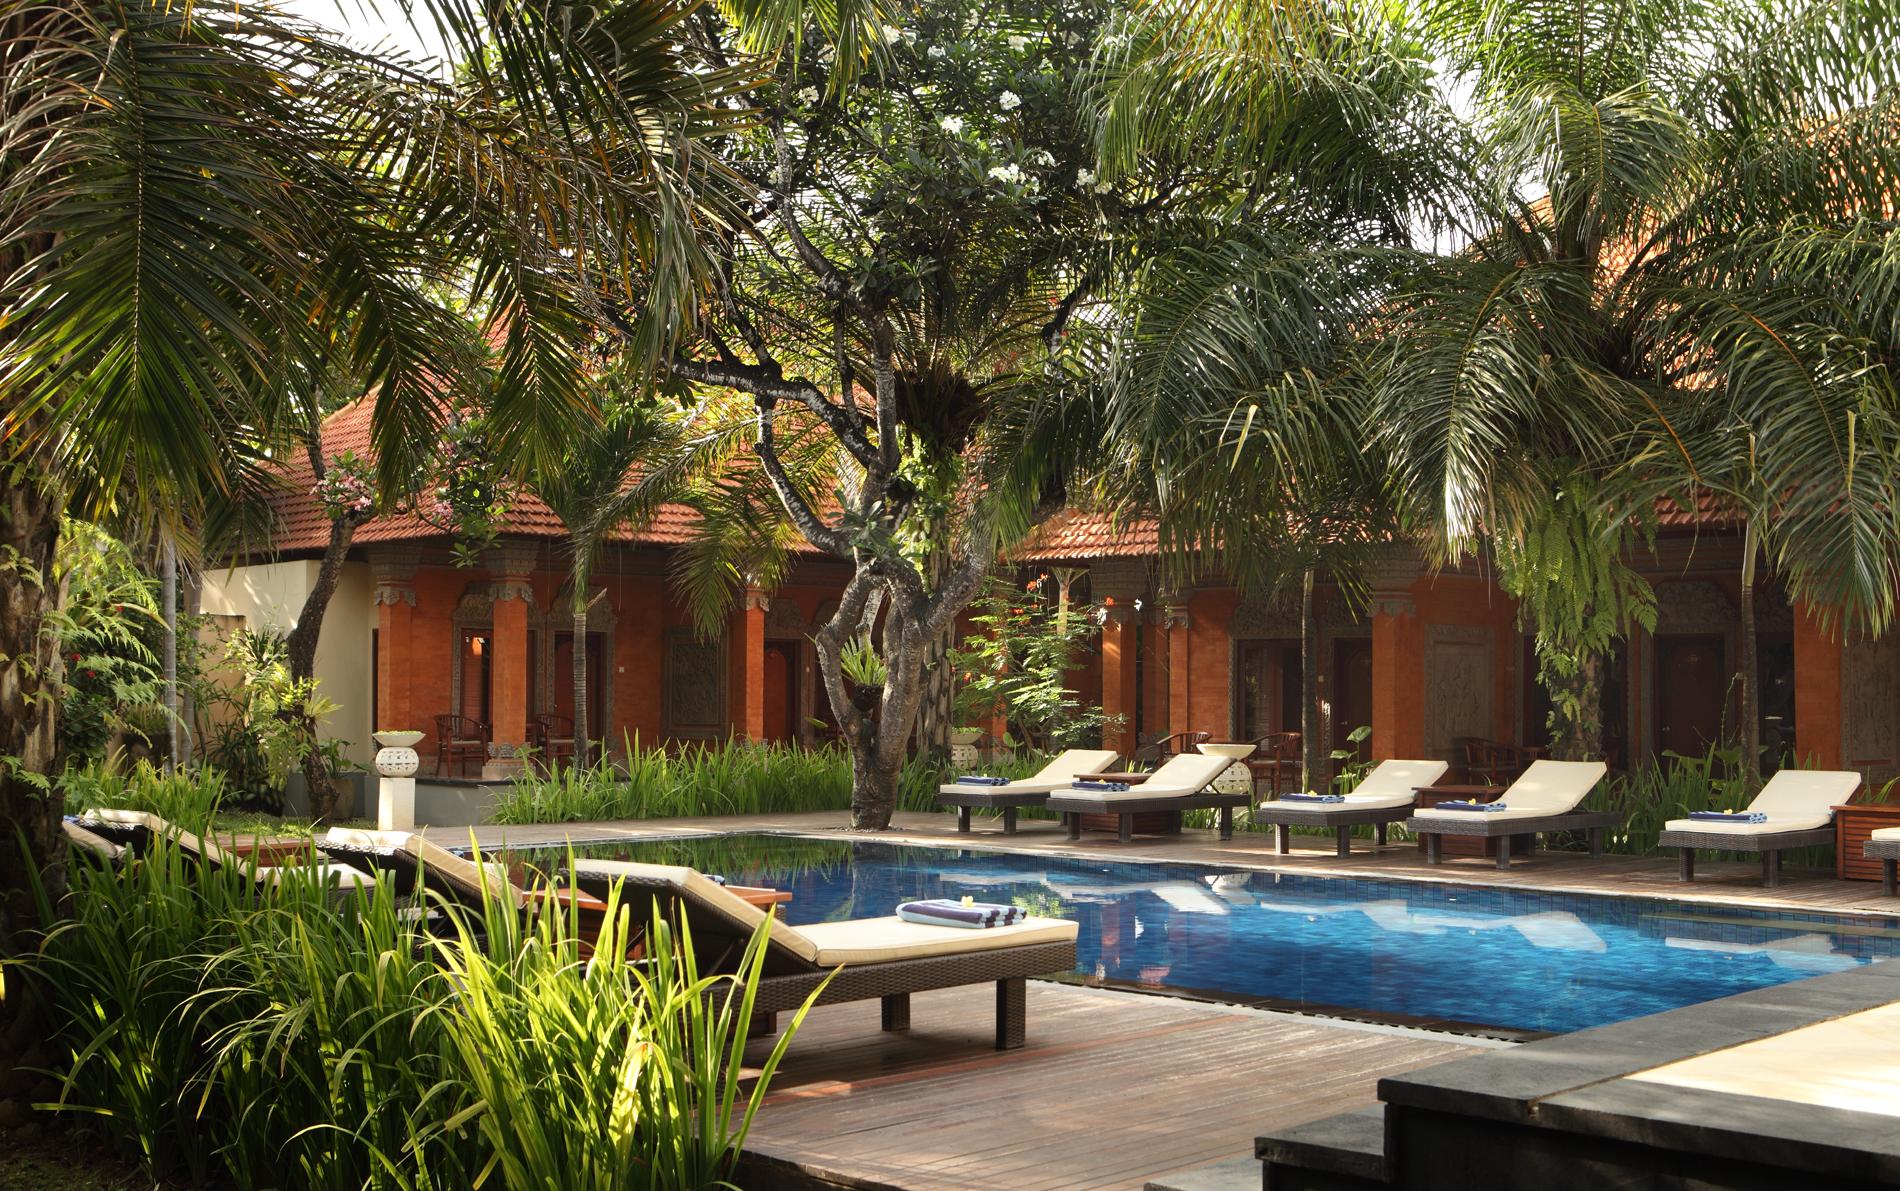 garden-pool-back1-l